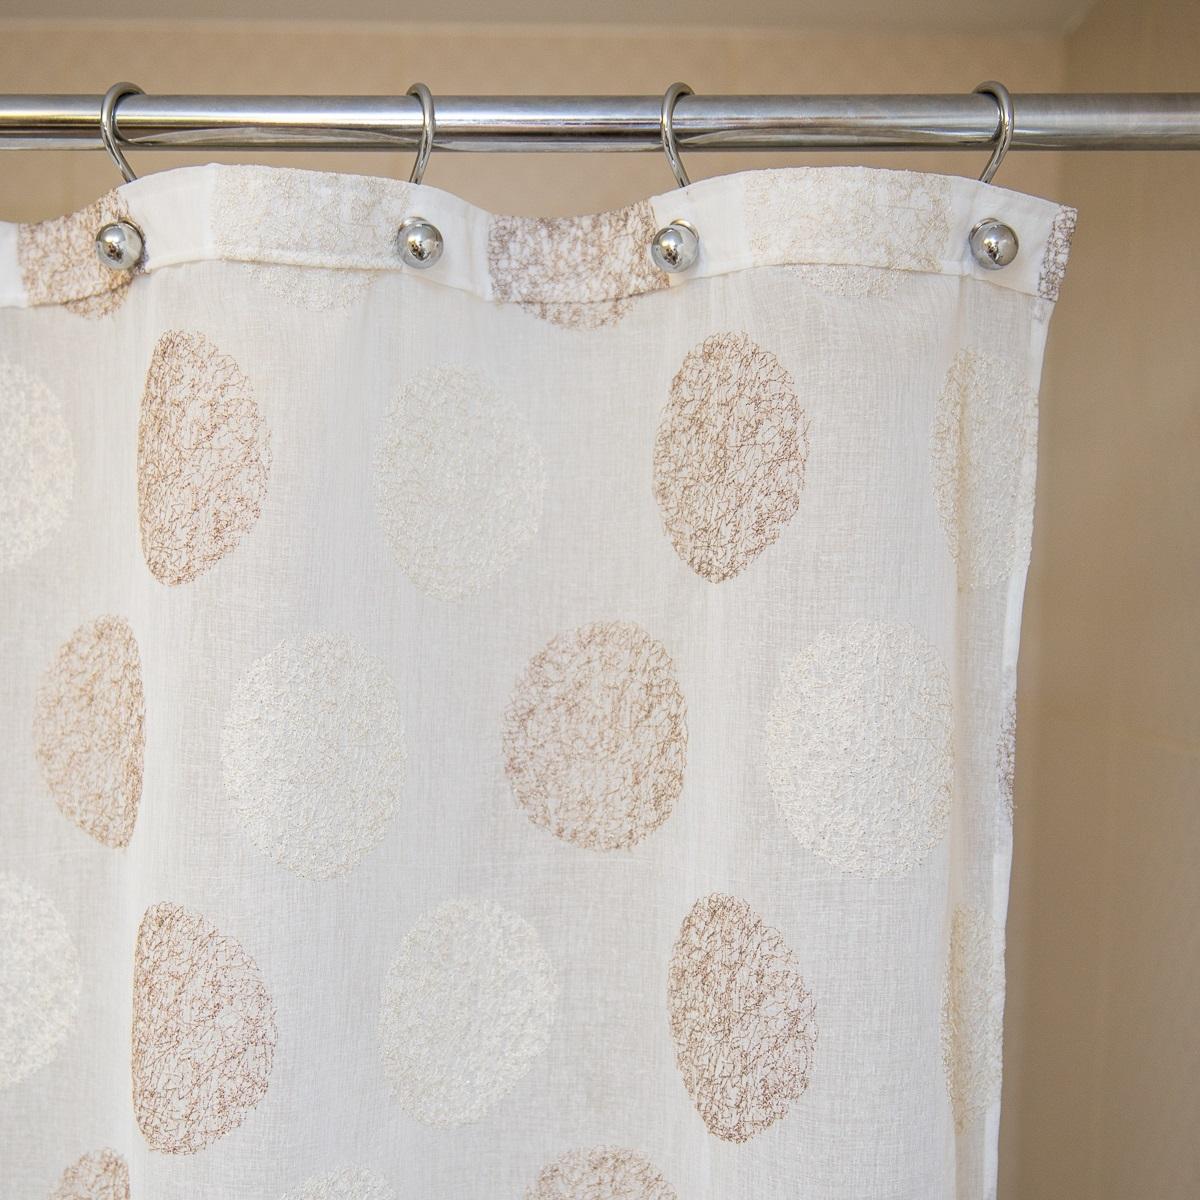 Шторки для ванной Шторка для ванной 180x200 Arti-Deco Aviles Beige elitnaya-shtorka-dlya-vannoy-aviles-beige-ot-arti-deco-ispaniya.jpg